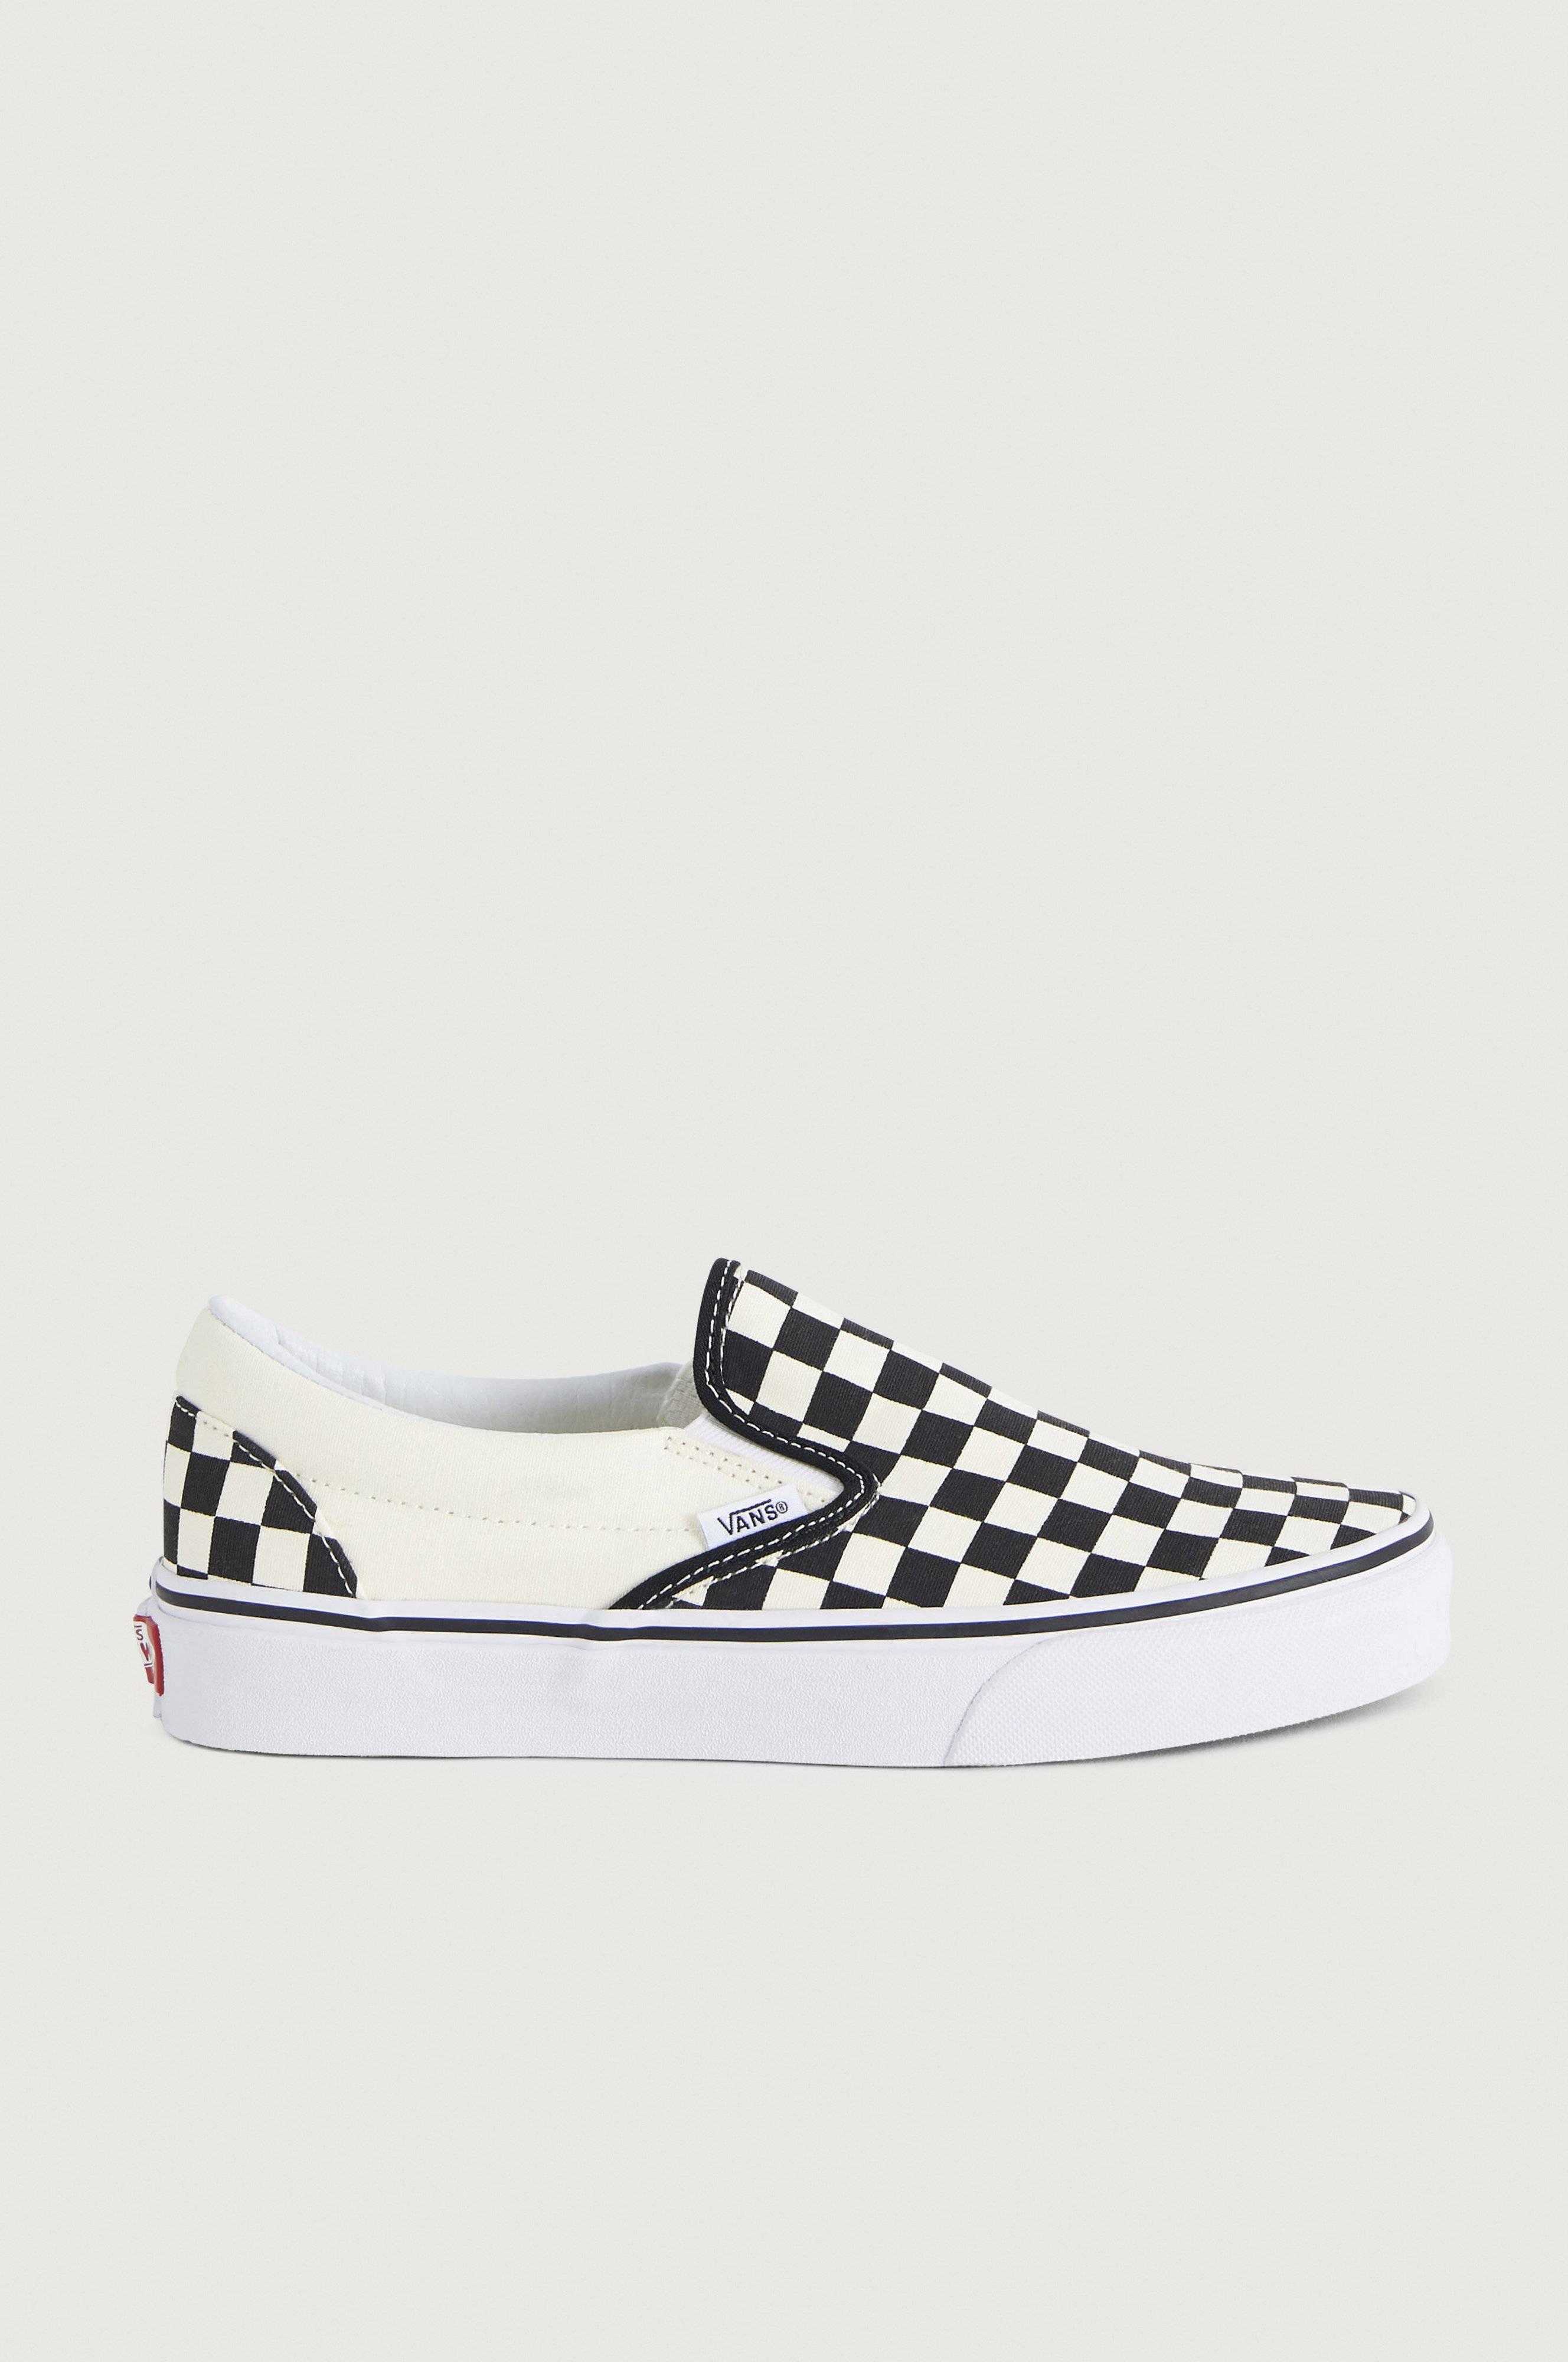 VANS Classic Slip-On Sneakers & textilskor Svart/Vit